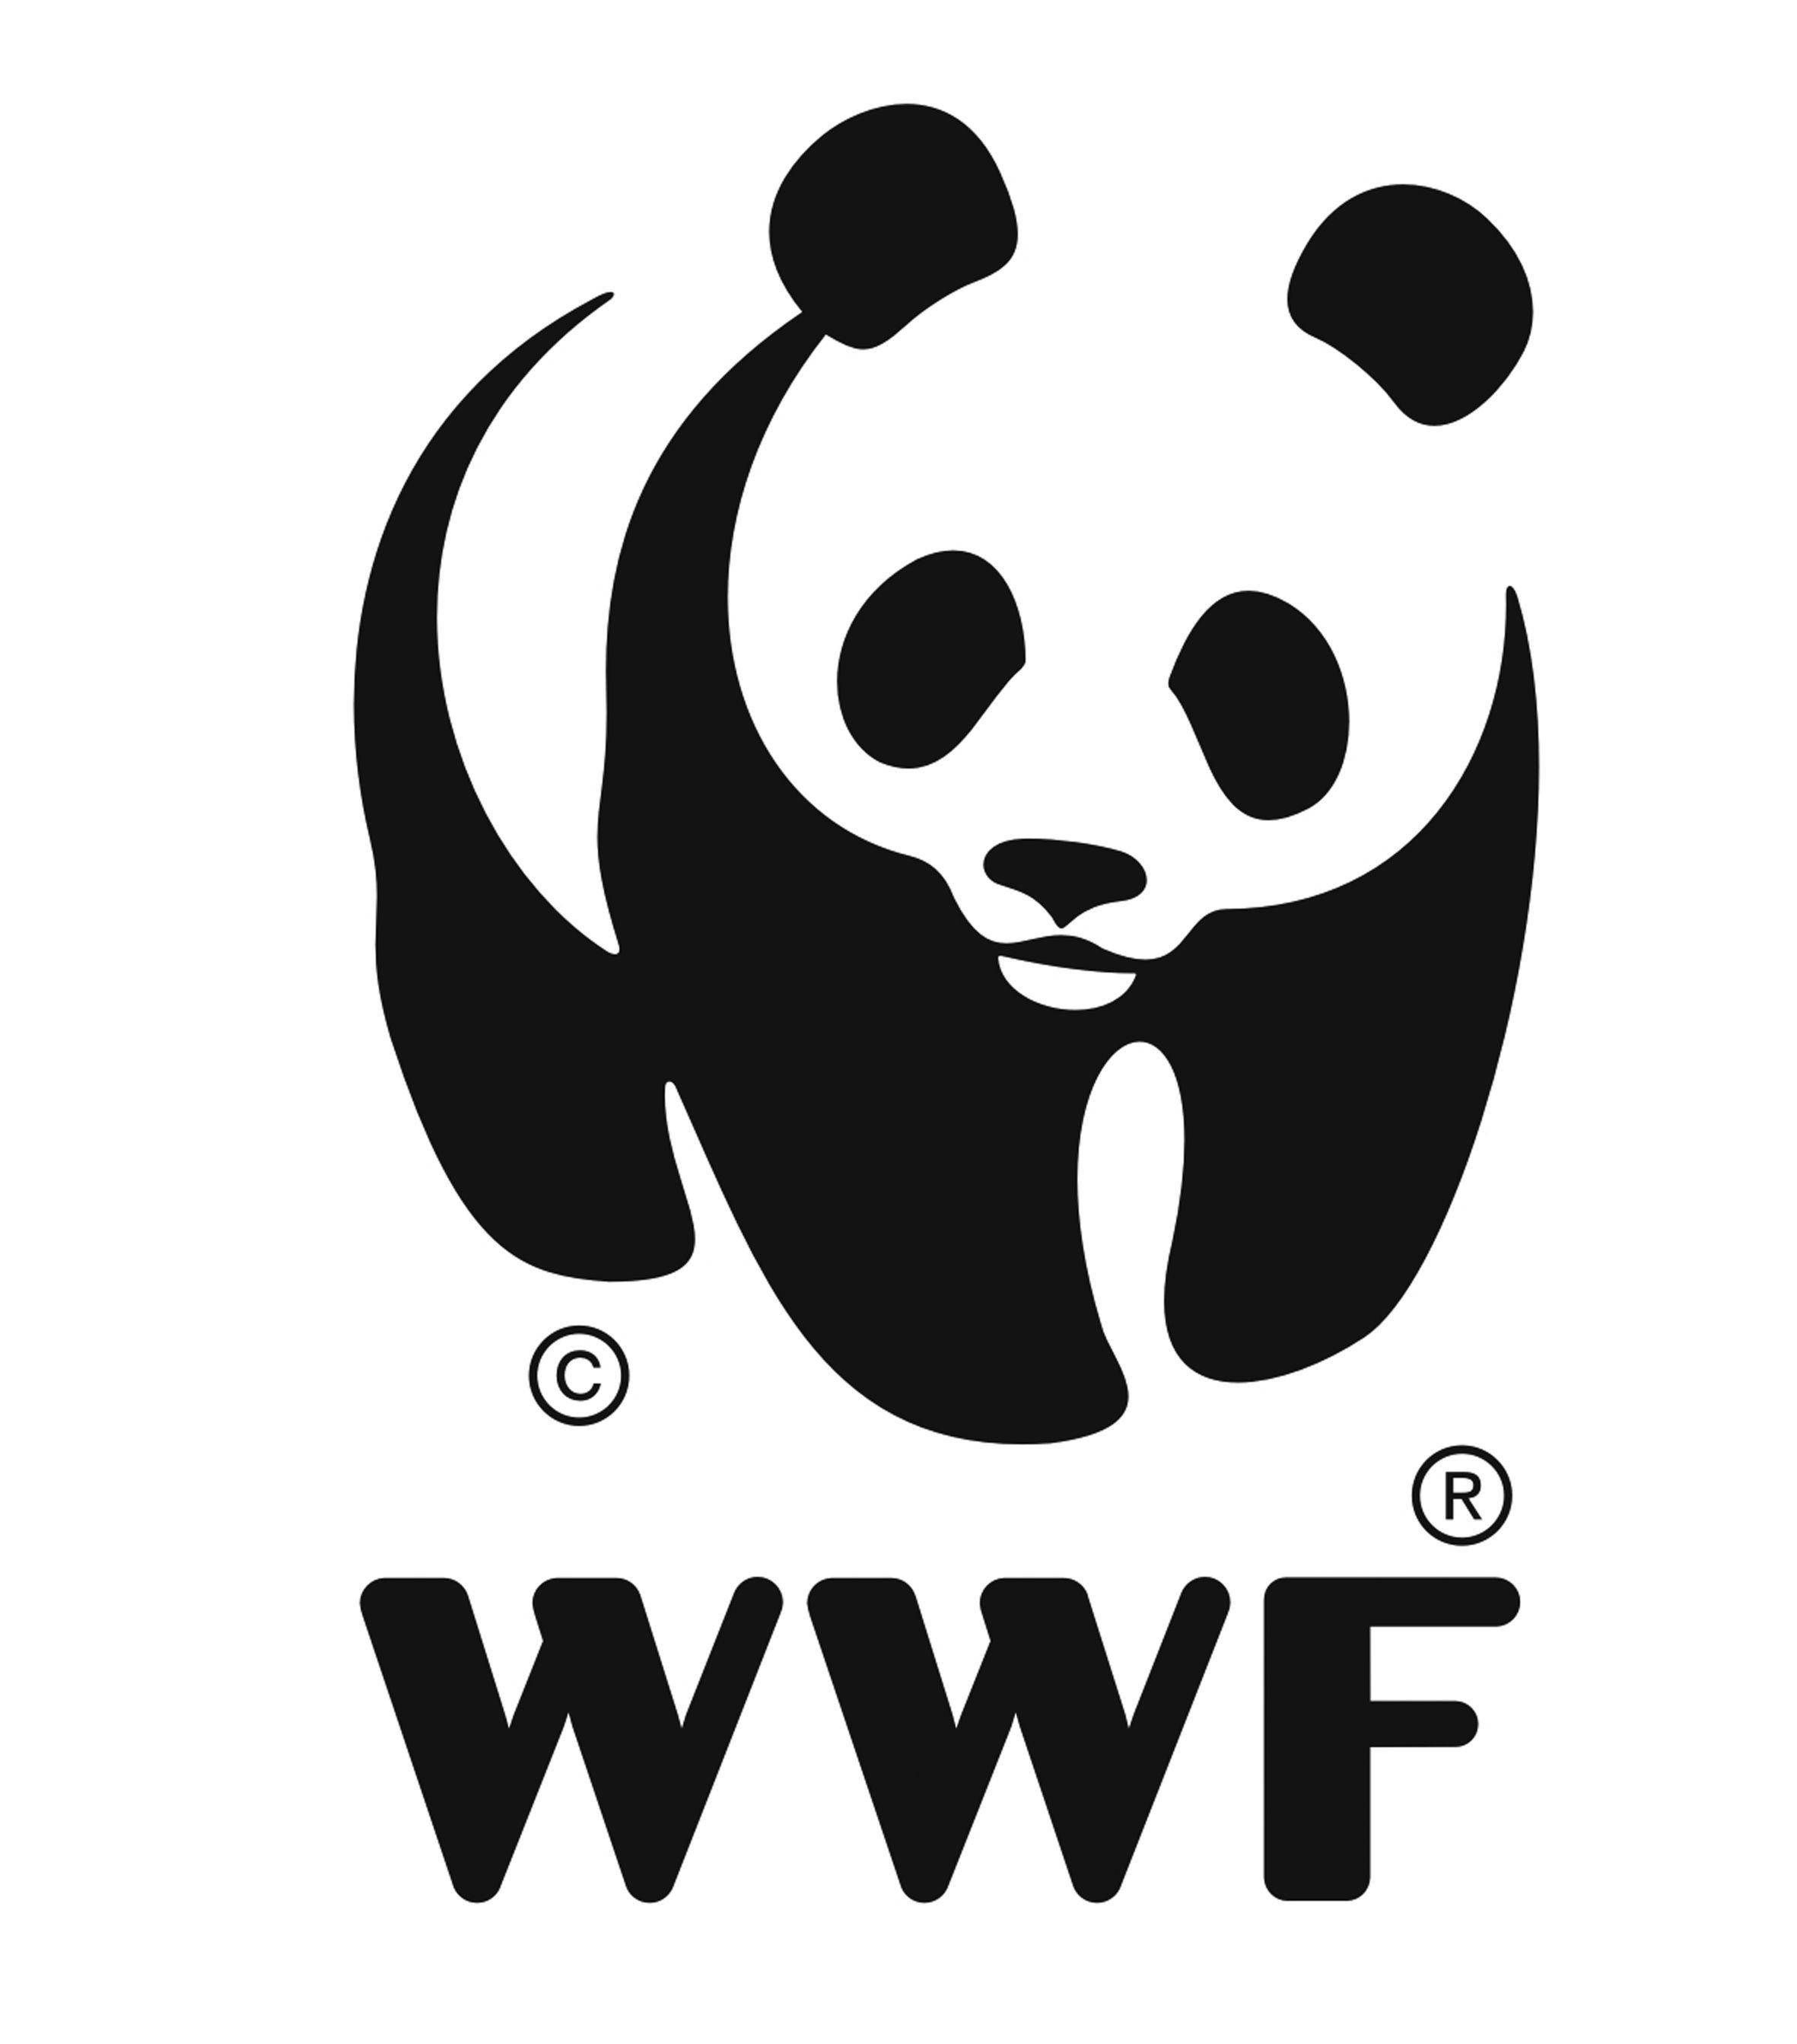 WWF logo (World Wildlife Fund) by Peter Scott (UK) – logo panda